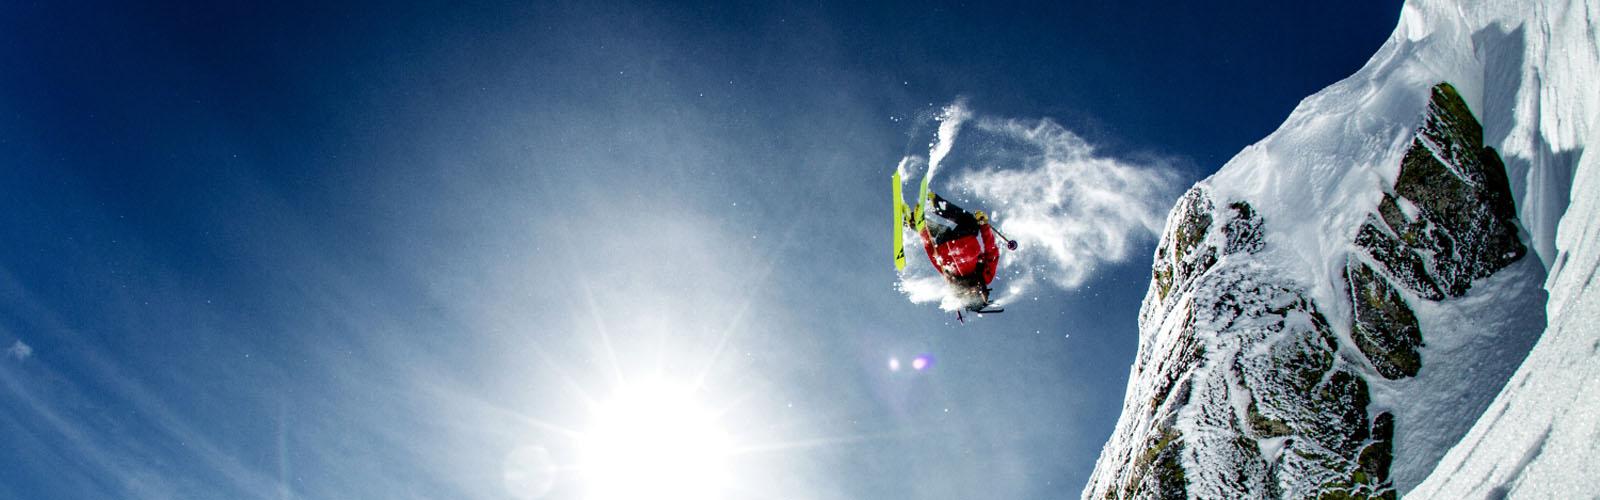 Sport Milanovic - Freeride Ski mieten